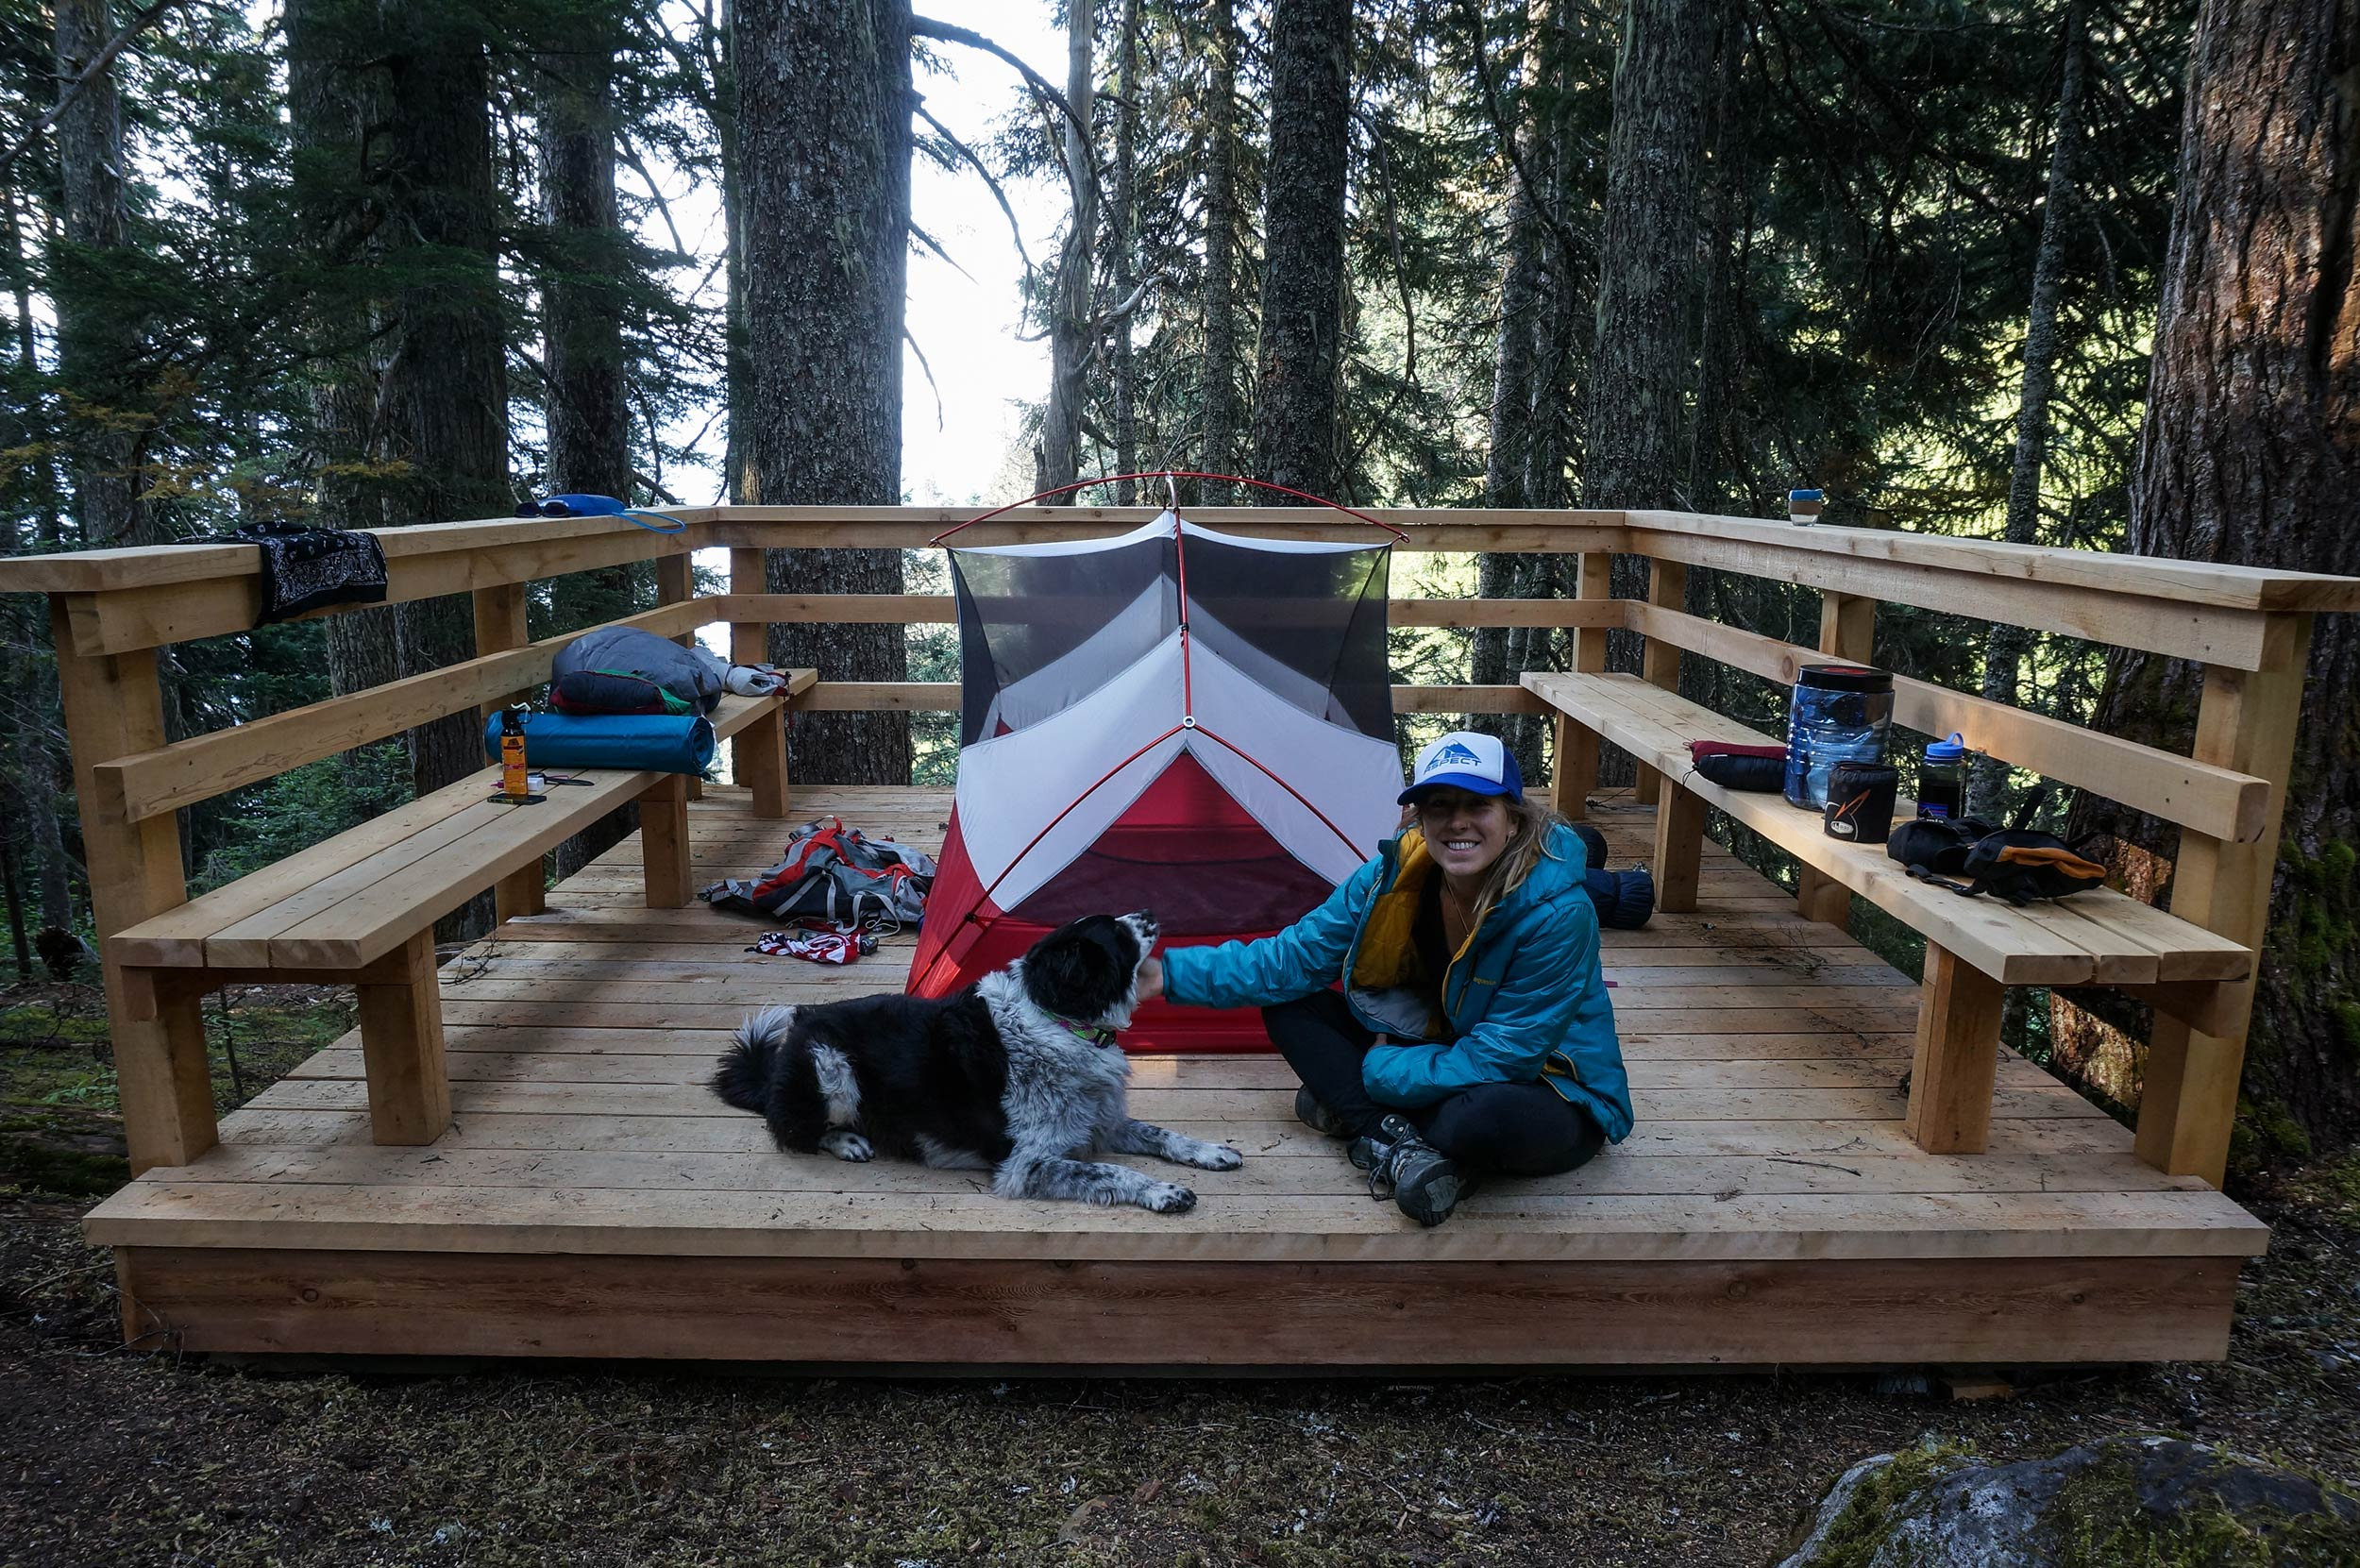 sproatt_alpine_trail_tent_platform_candice_nugget.jpg